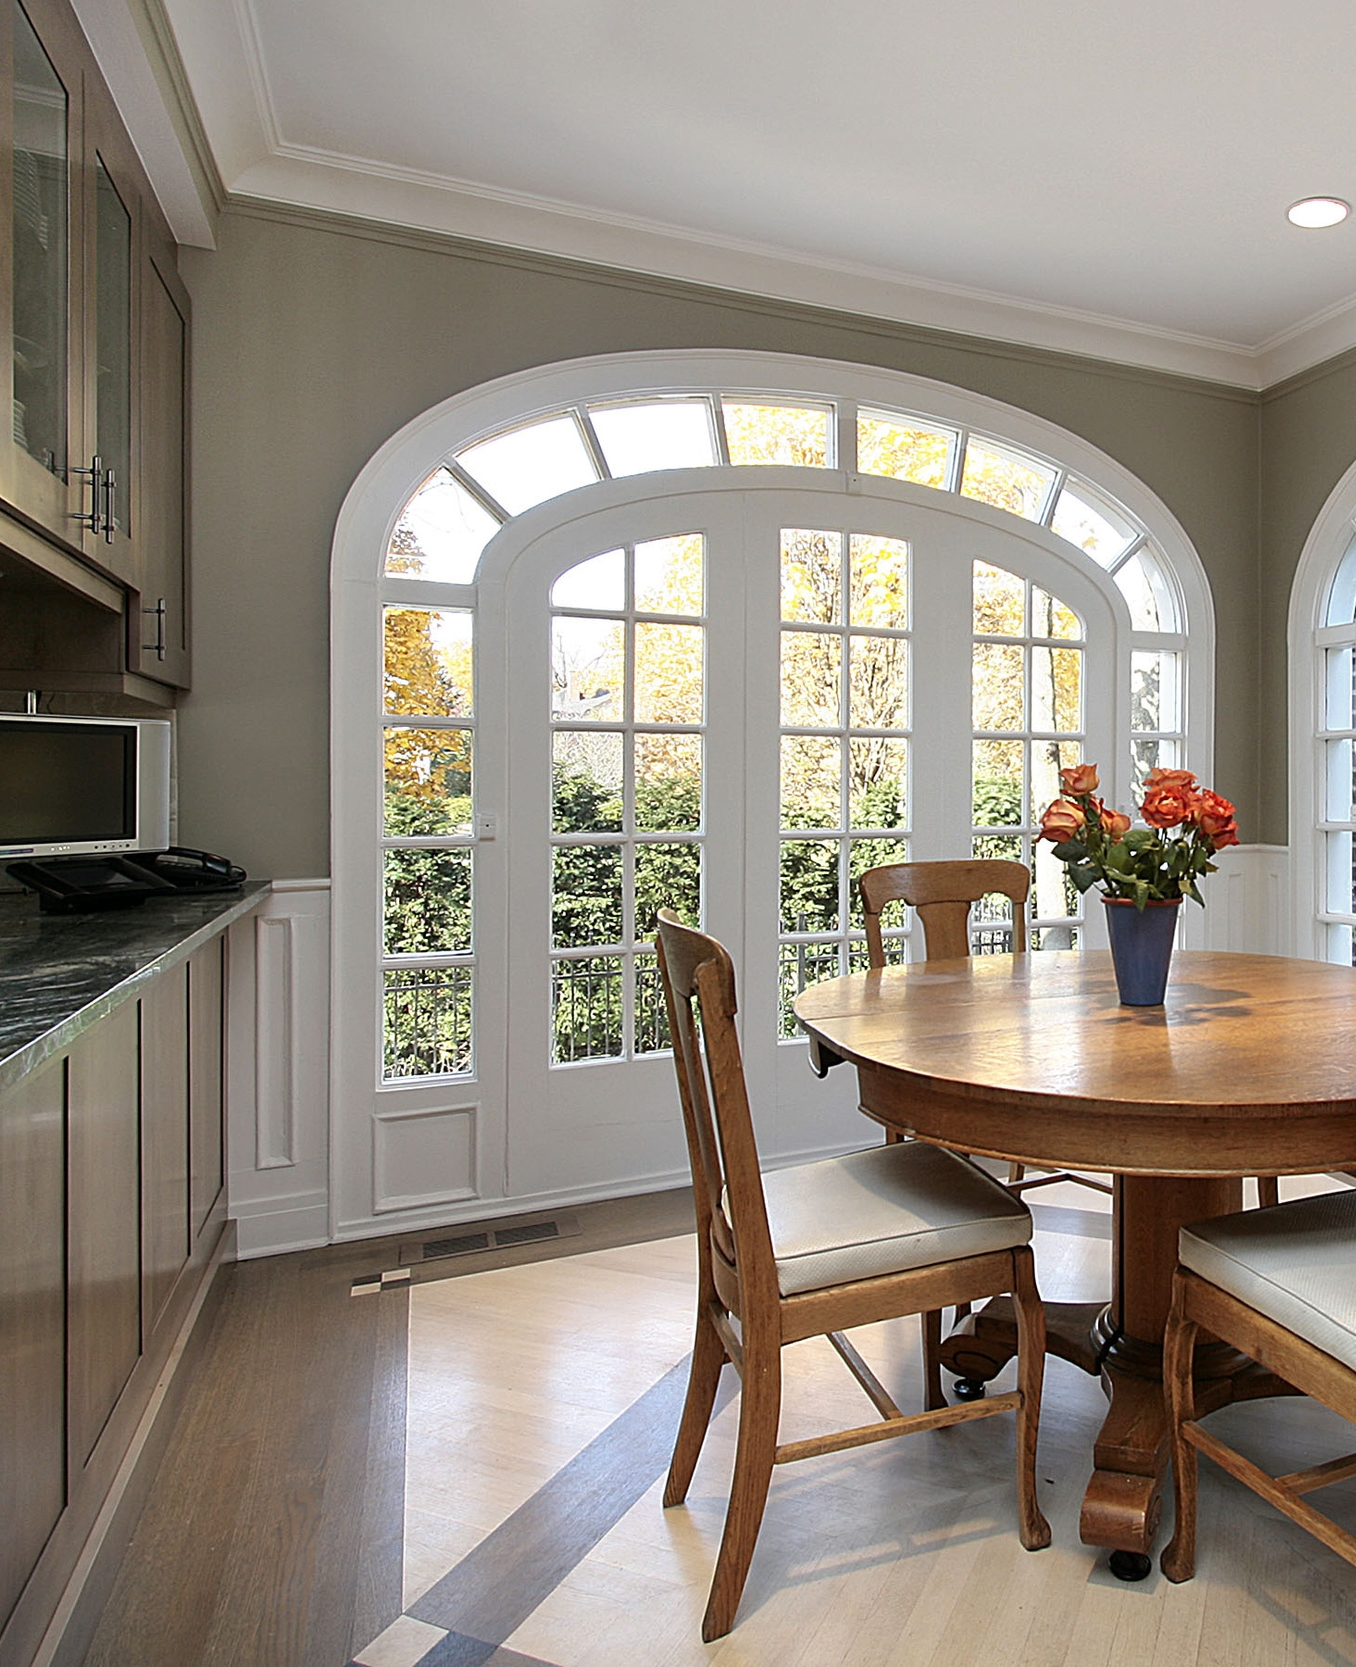 inspiring-home-interior-decor-florida-designer-spectacular-spaces-27856815.jpg